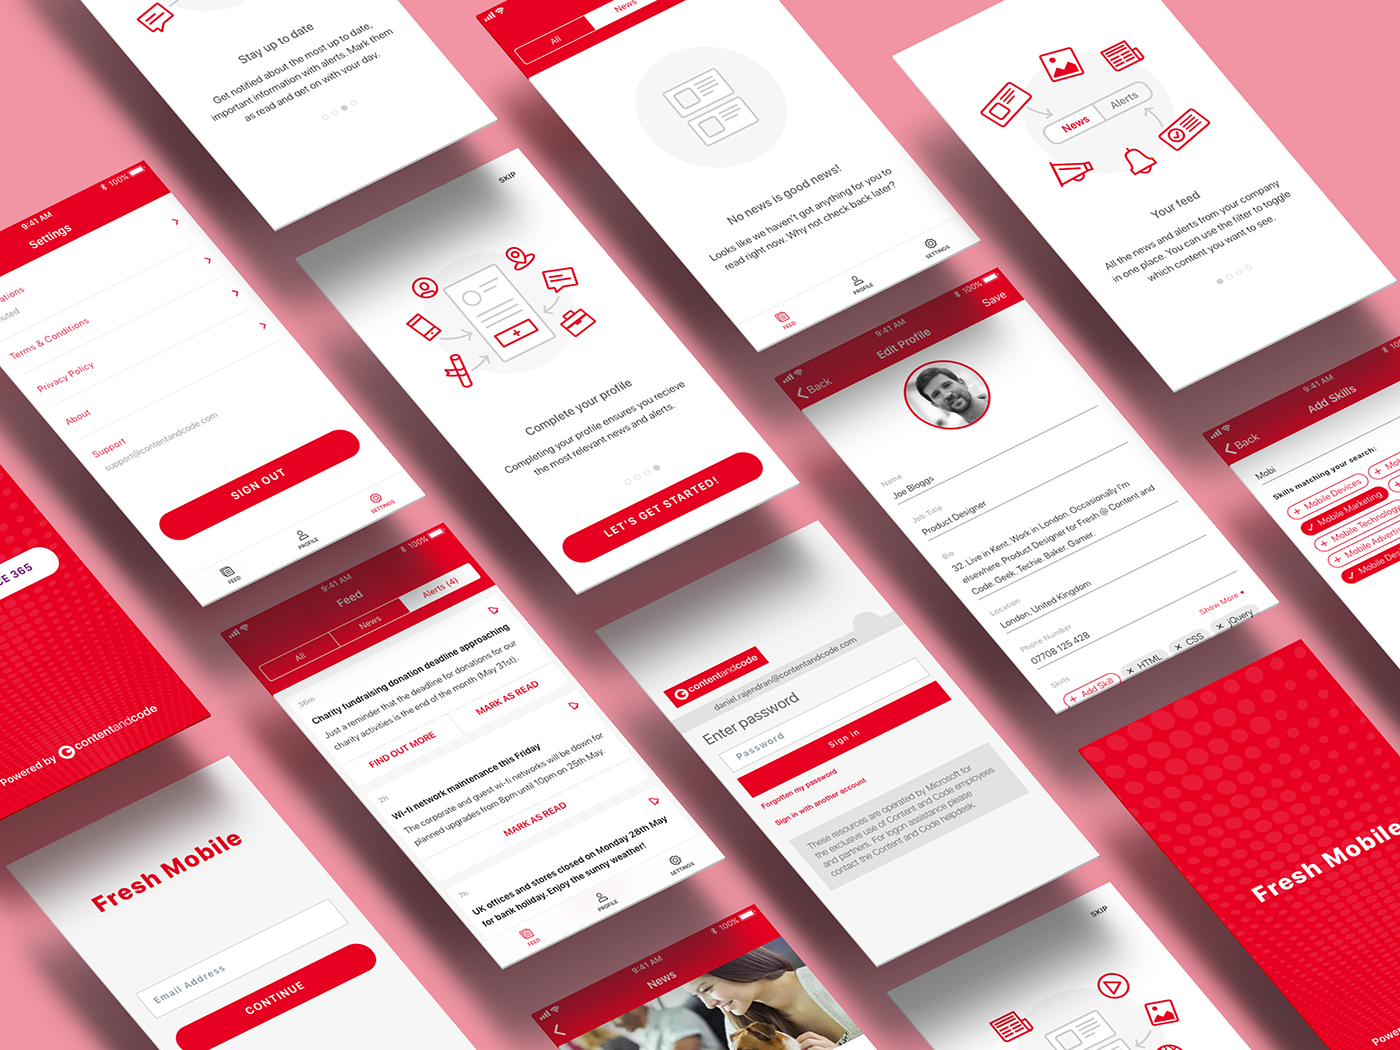 print design  Brand Design product design  iconography merchandise visual design mobile design event artwork icon design  ILLUSTRATION